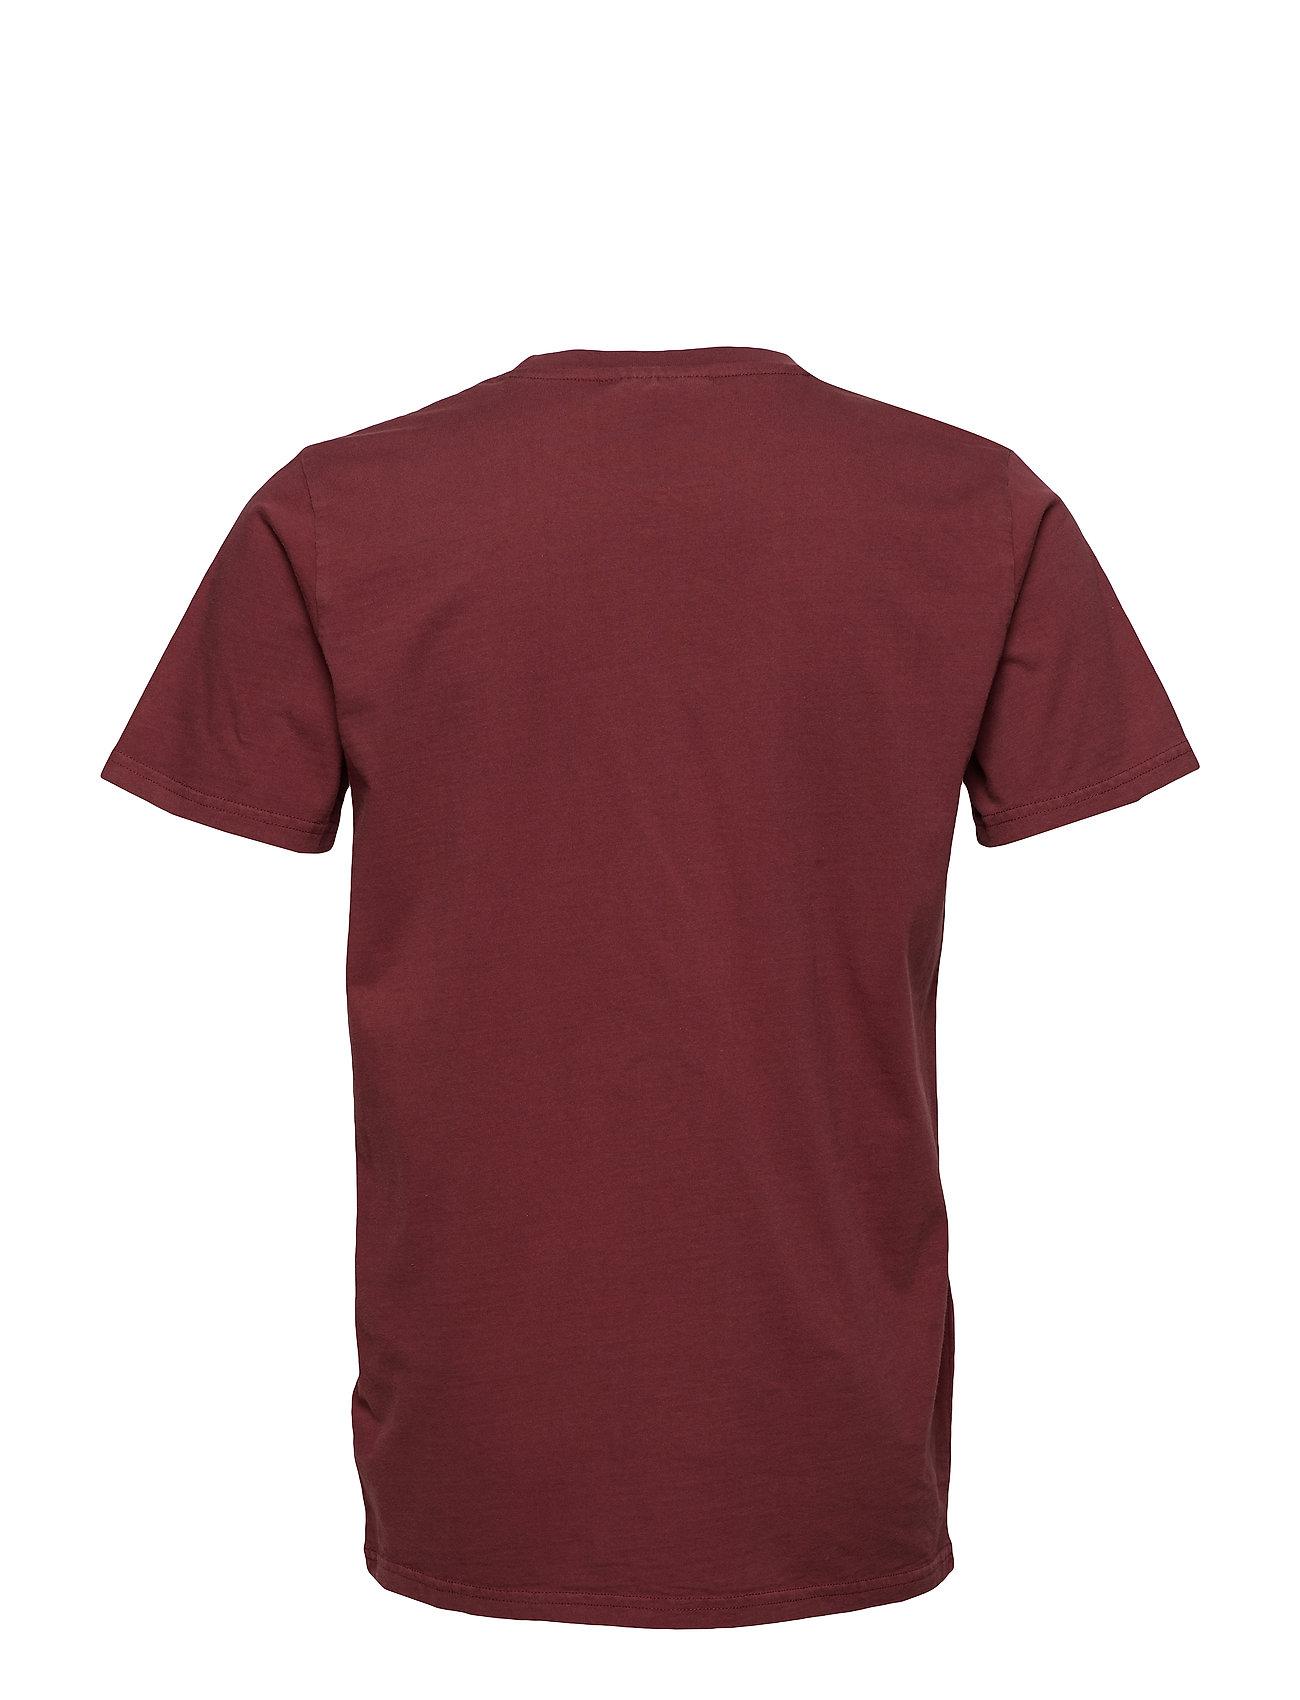 Casual Tee T shirt Rød HAN KJØBENHAVN